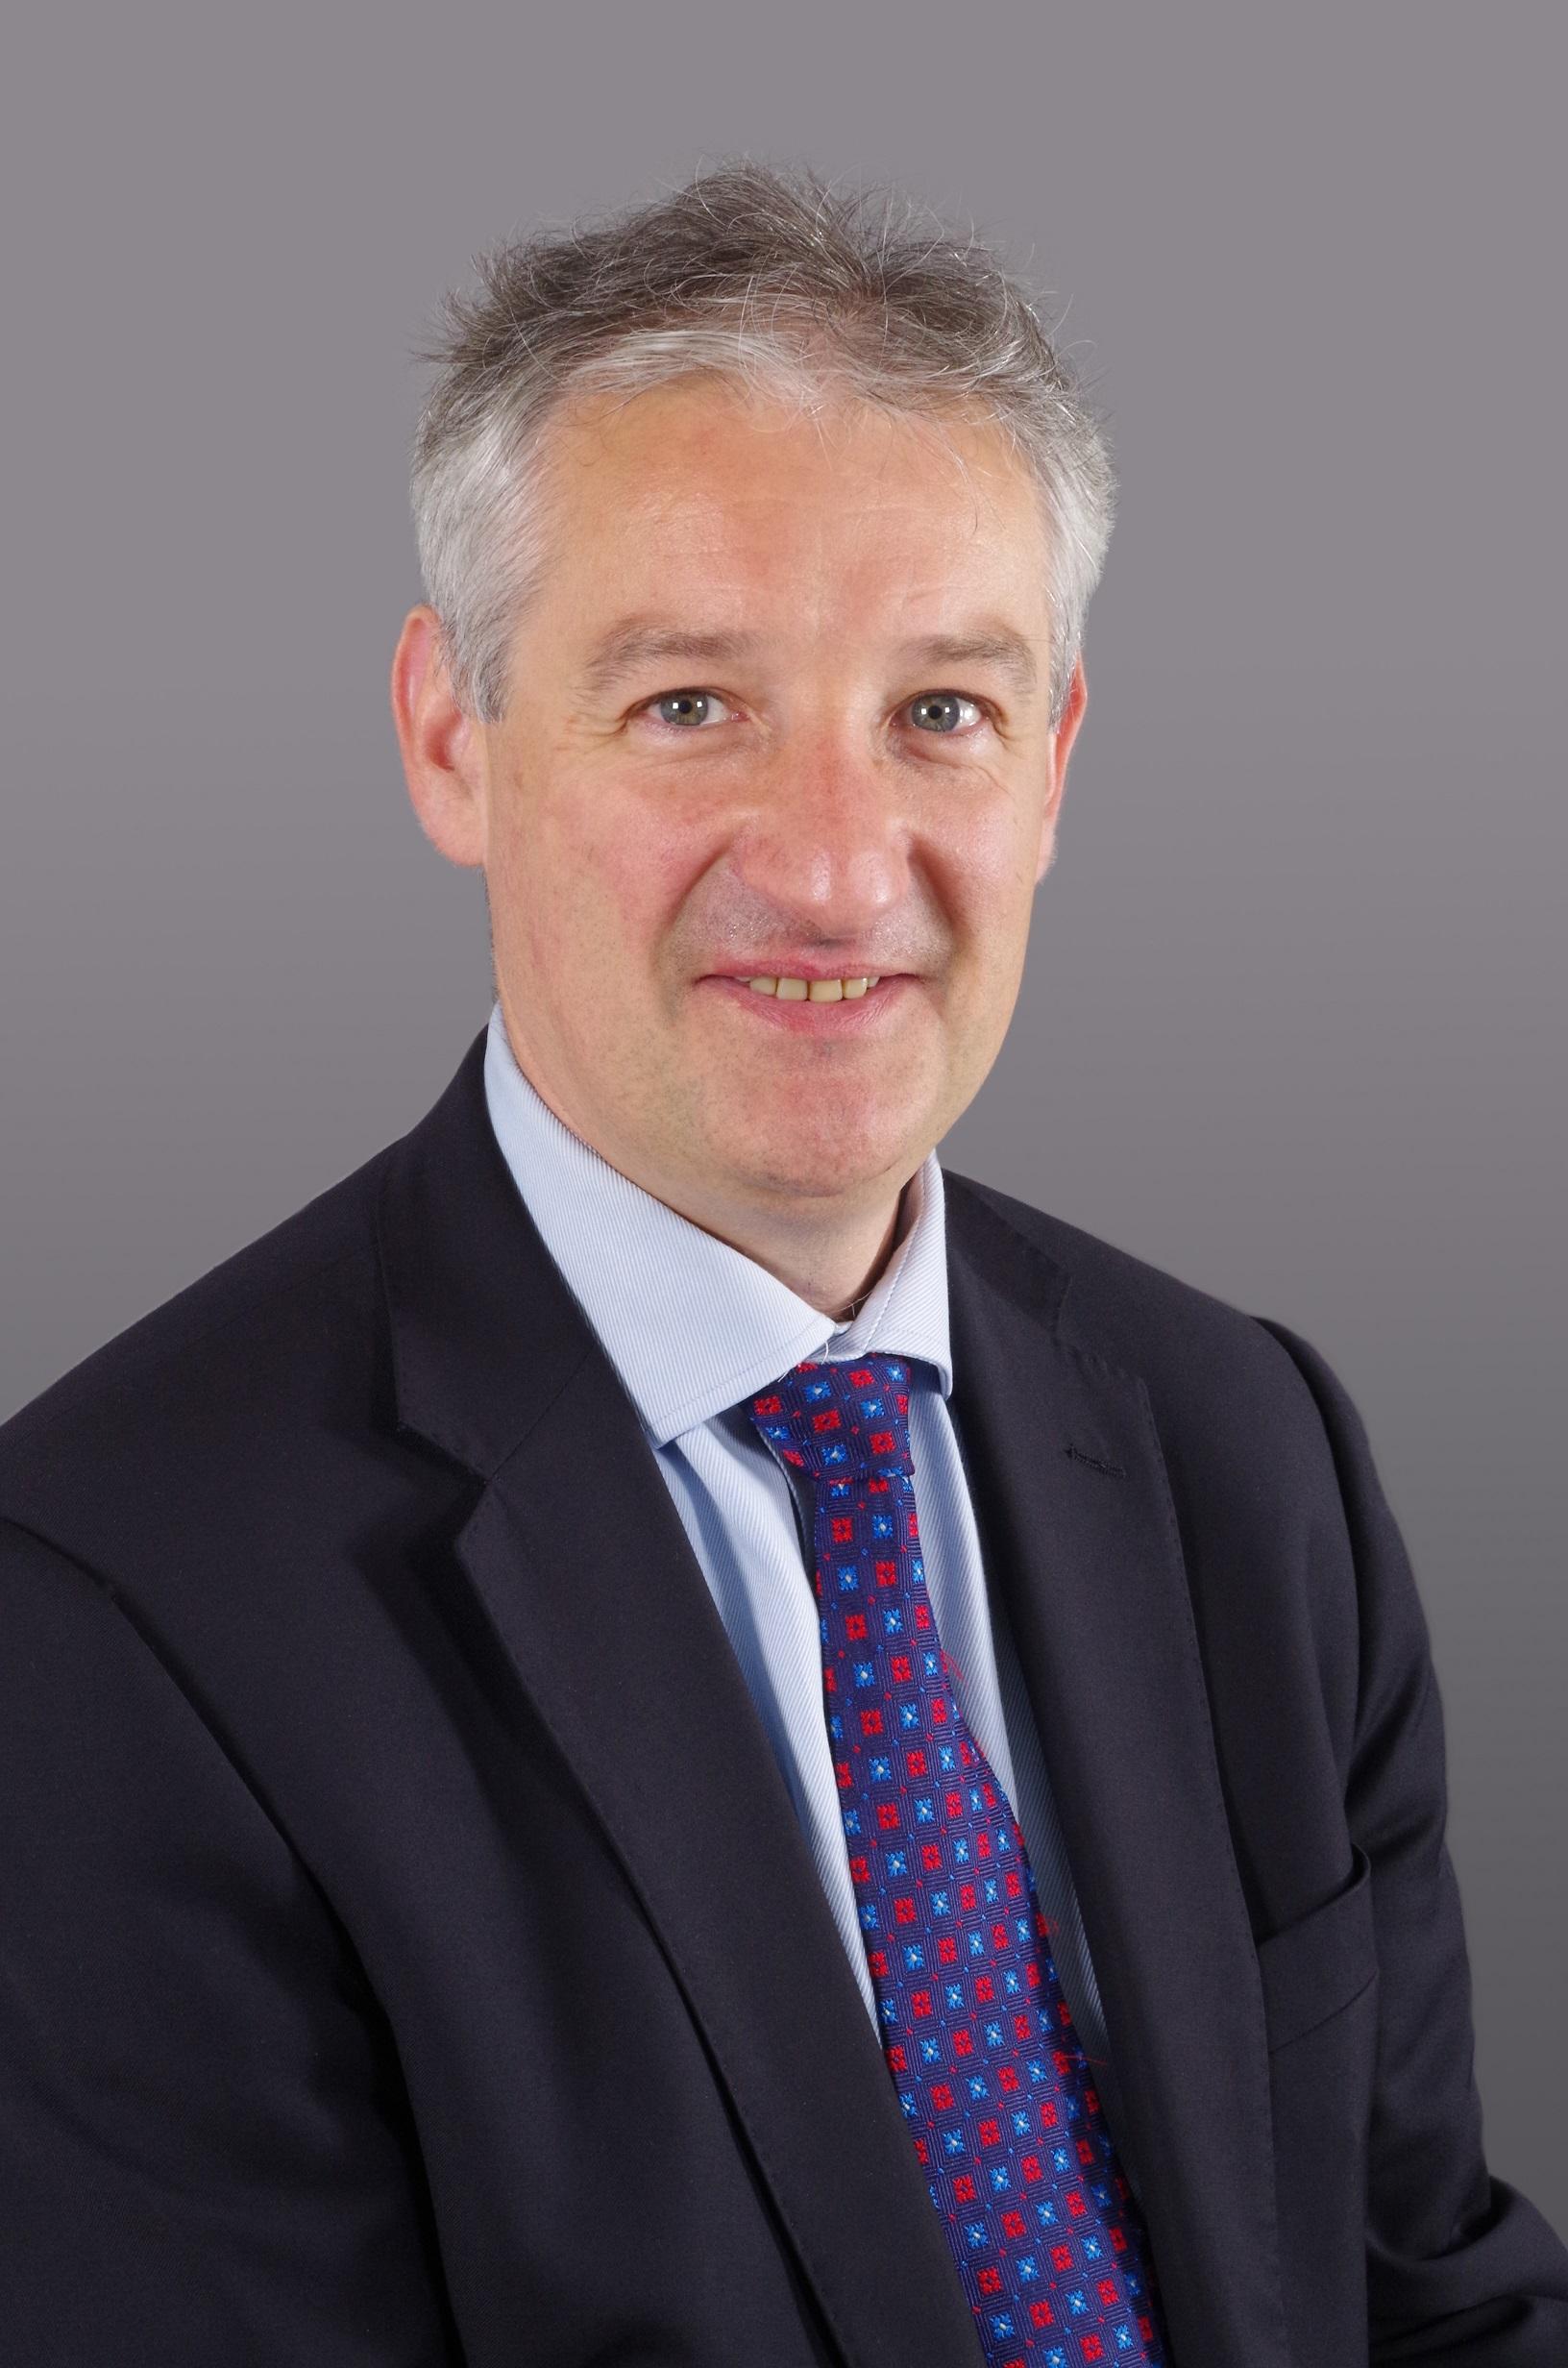 James Mitchiner - Principal